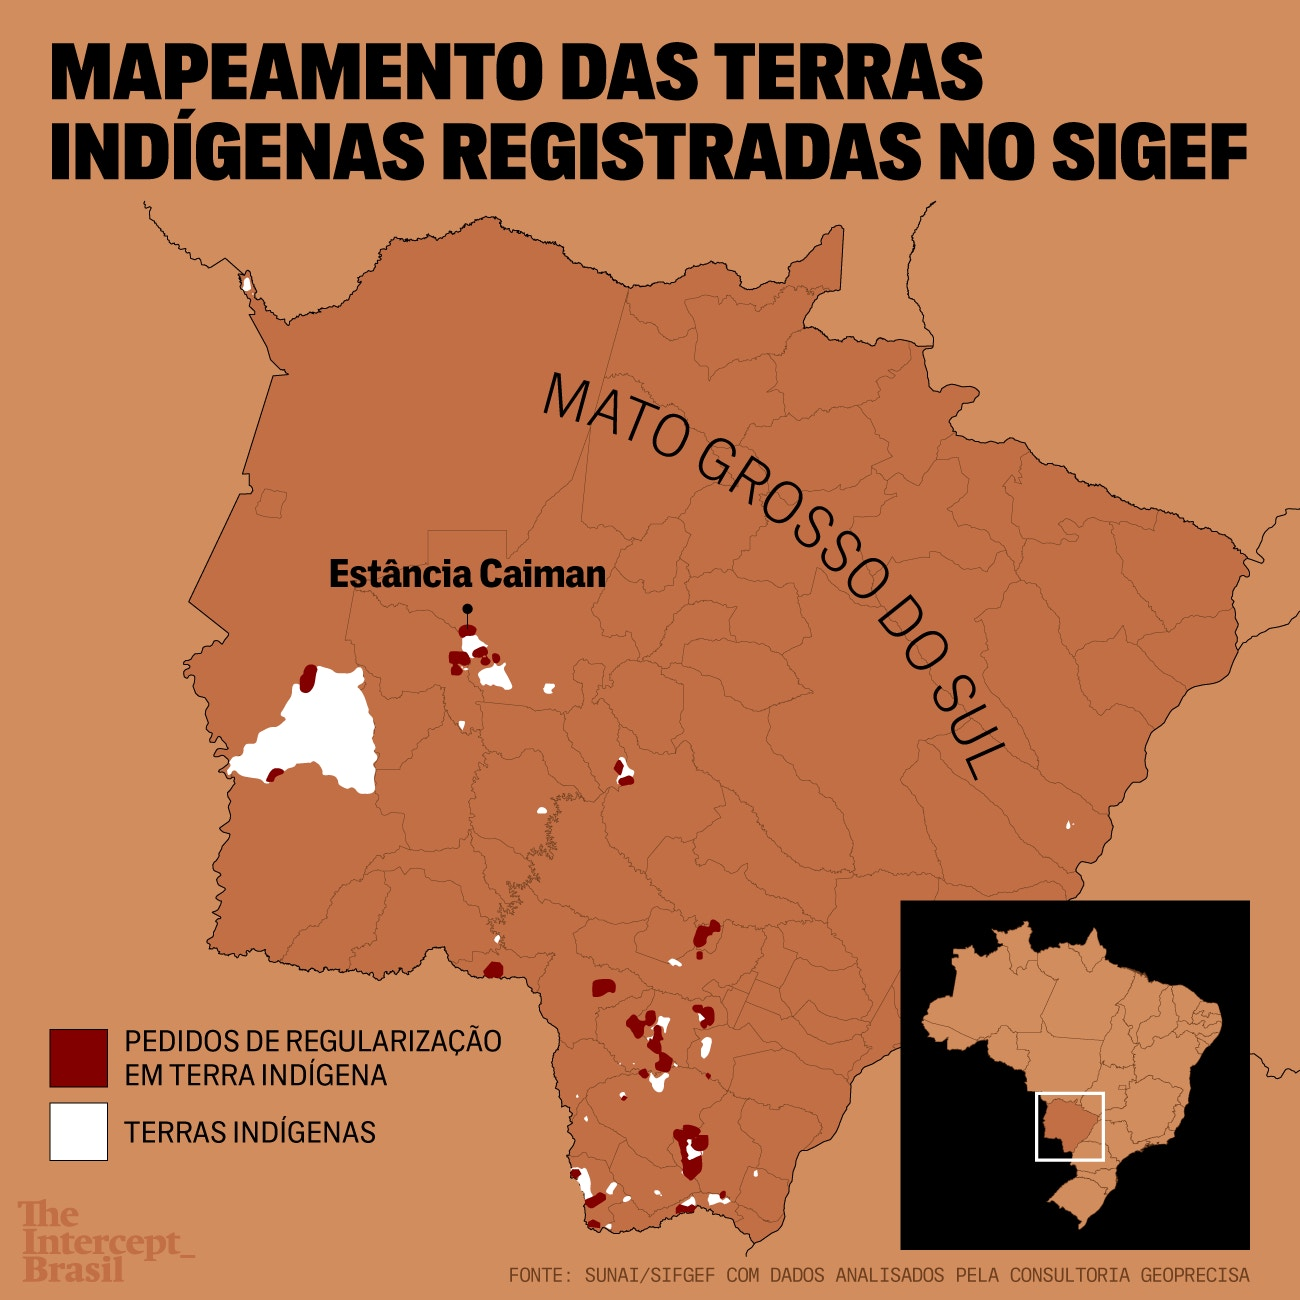 Mapa-MS-012